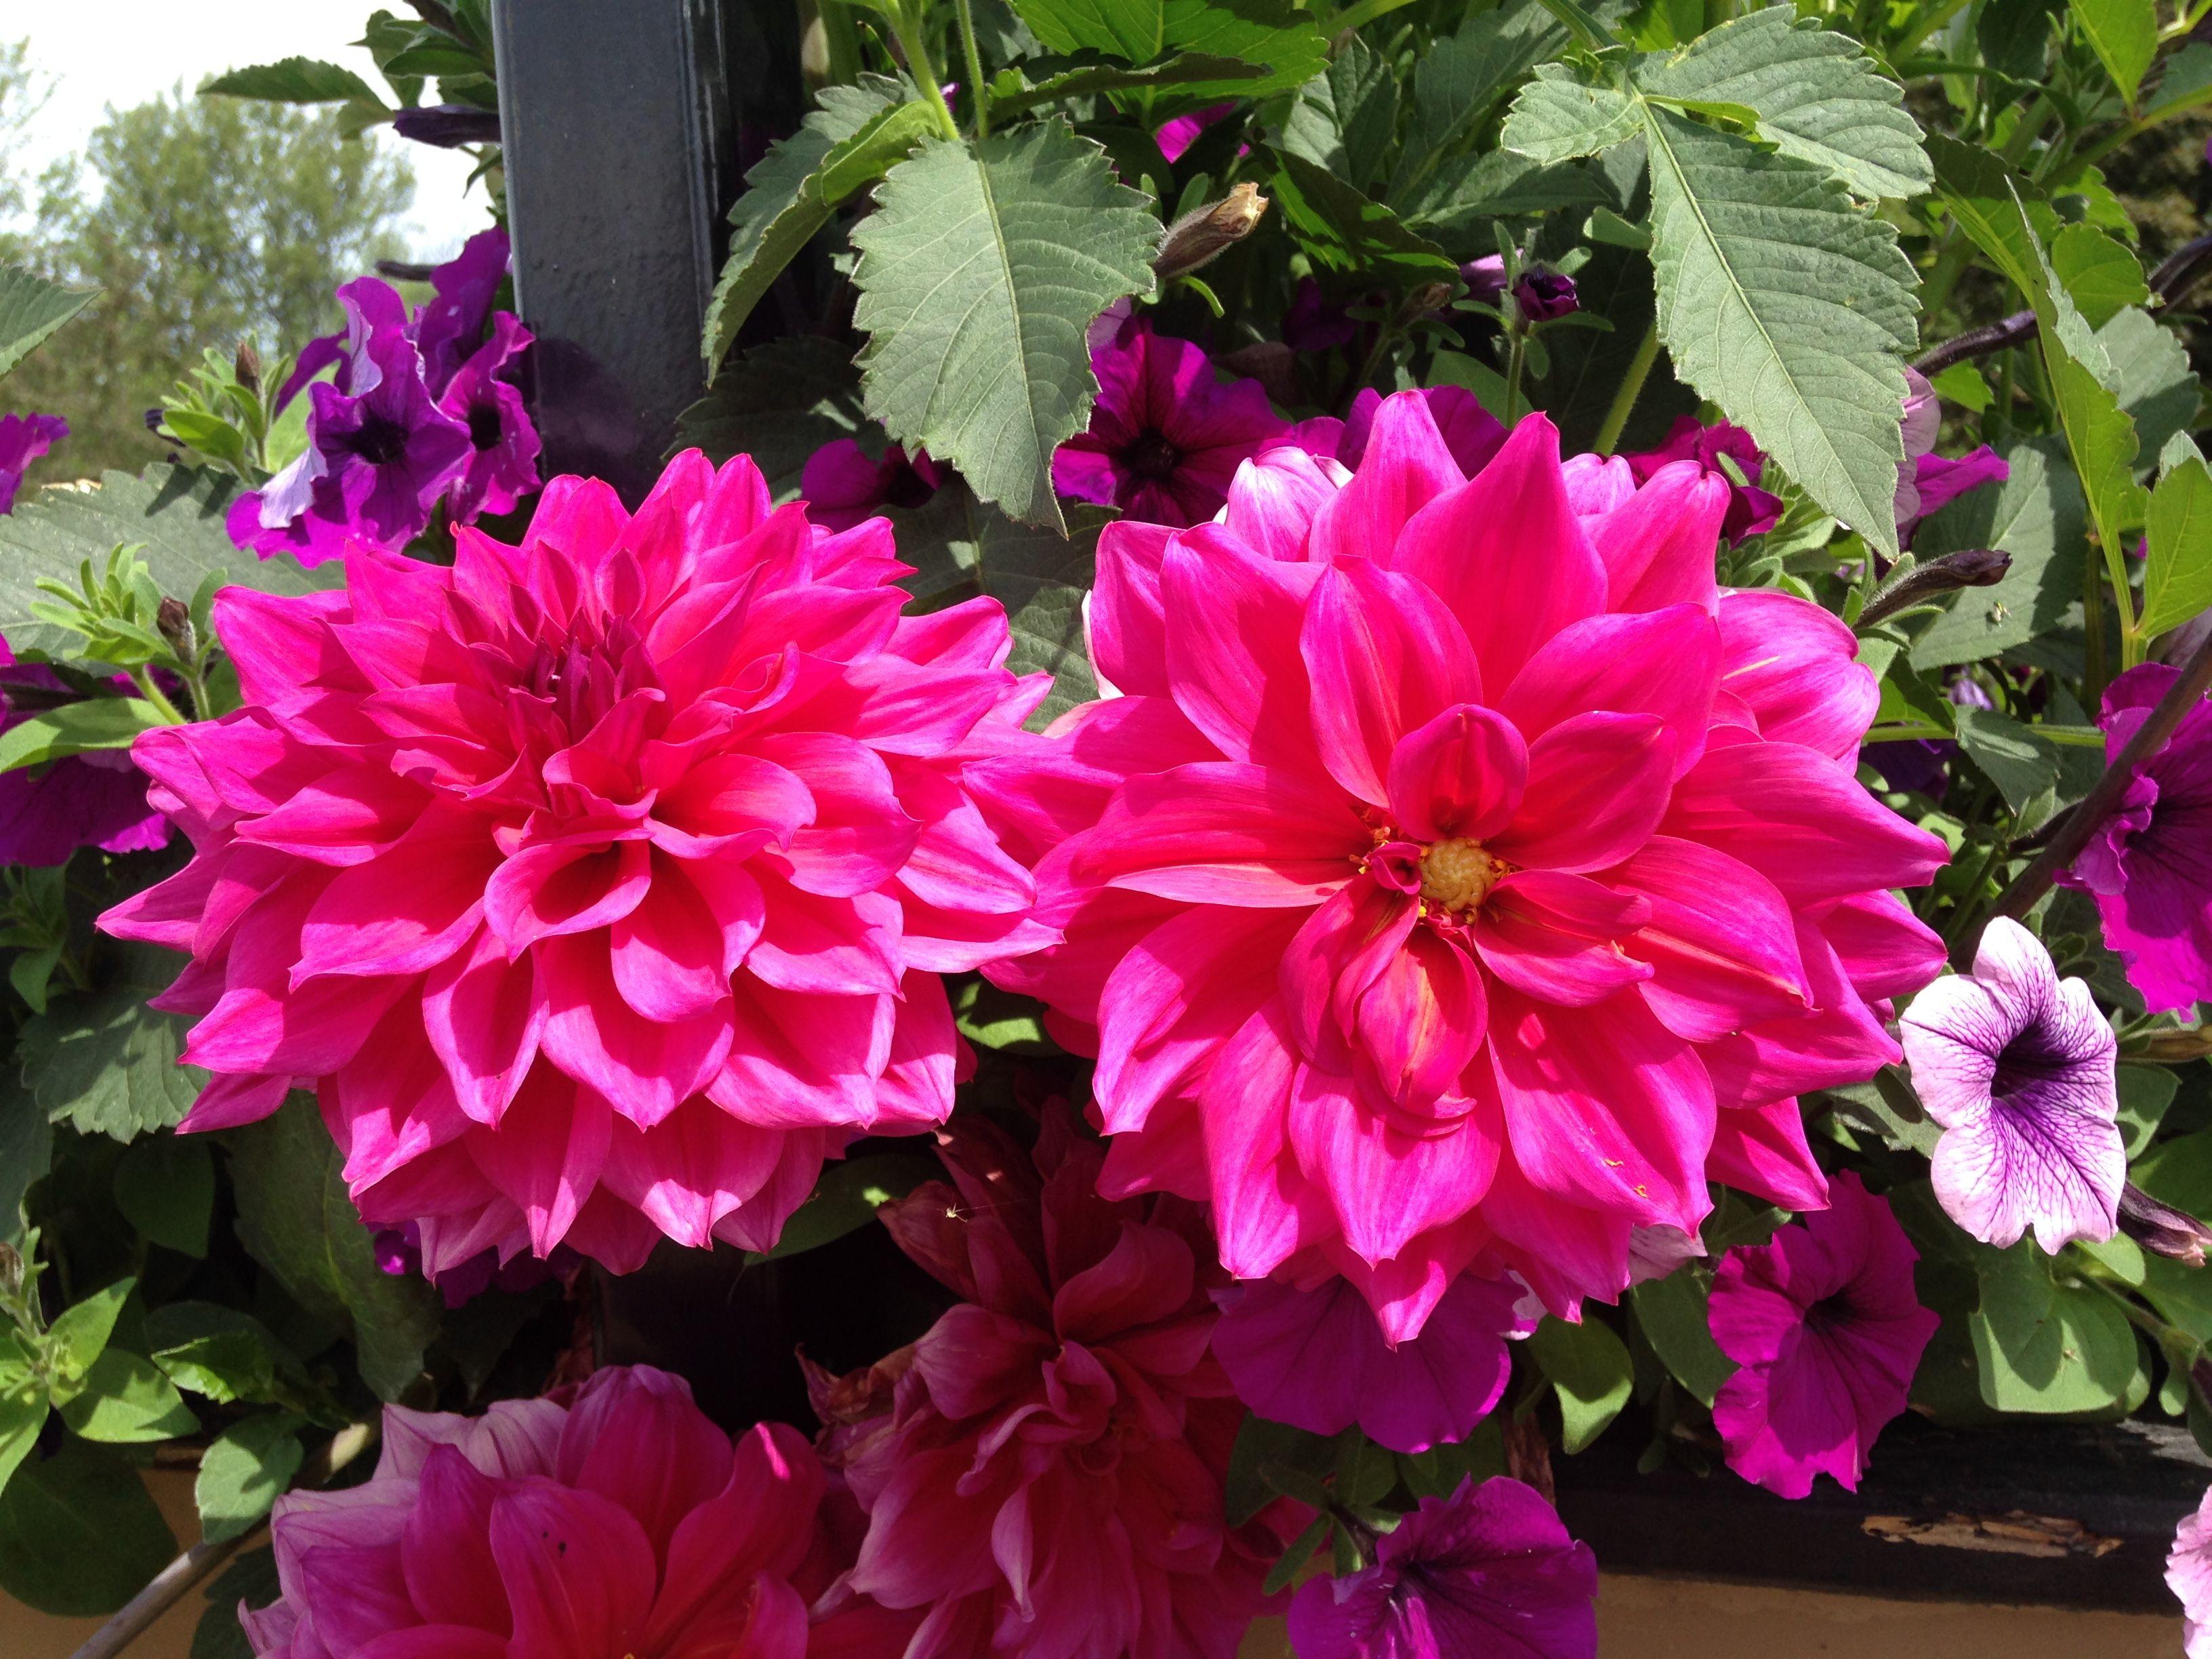 Dahlias a perennial flower blooming midsummer to the